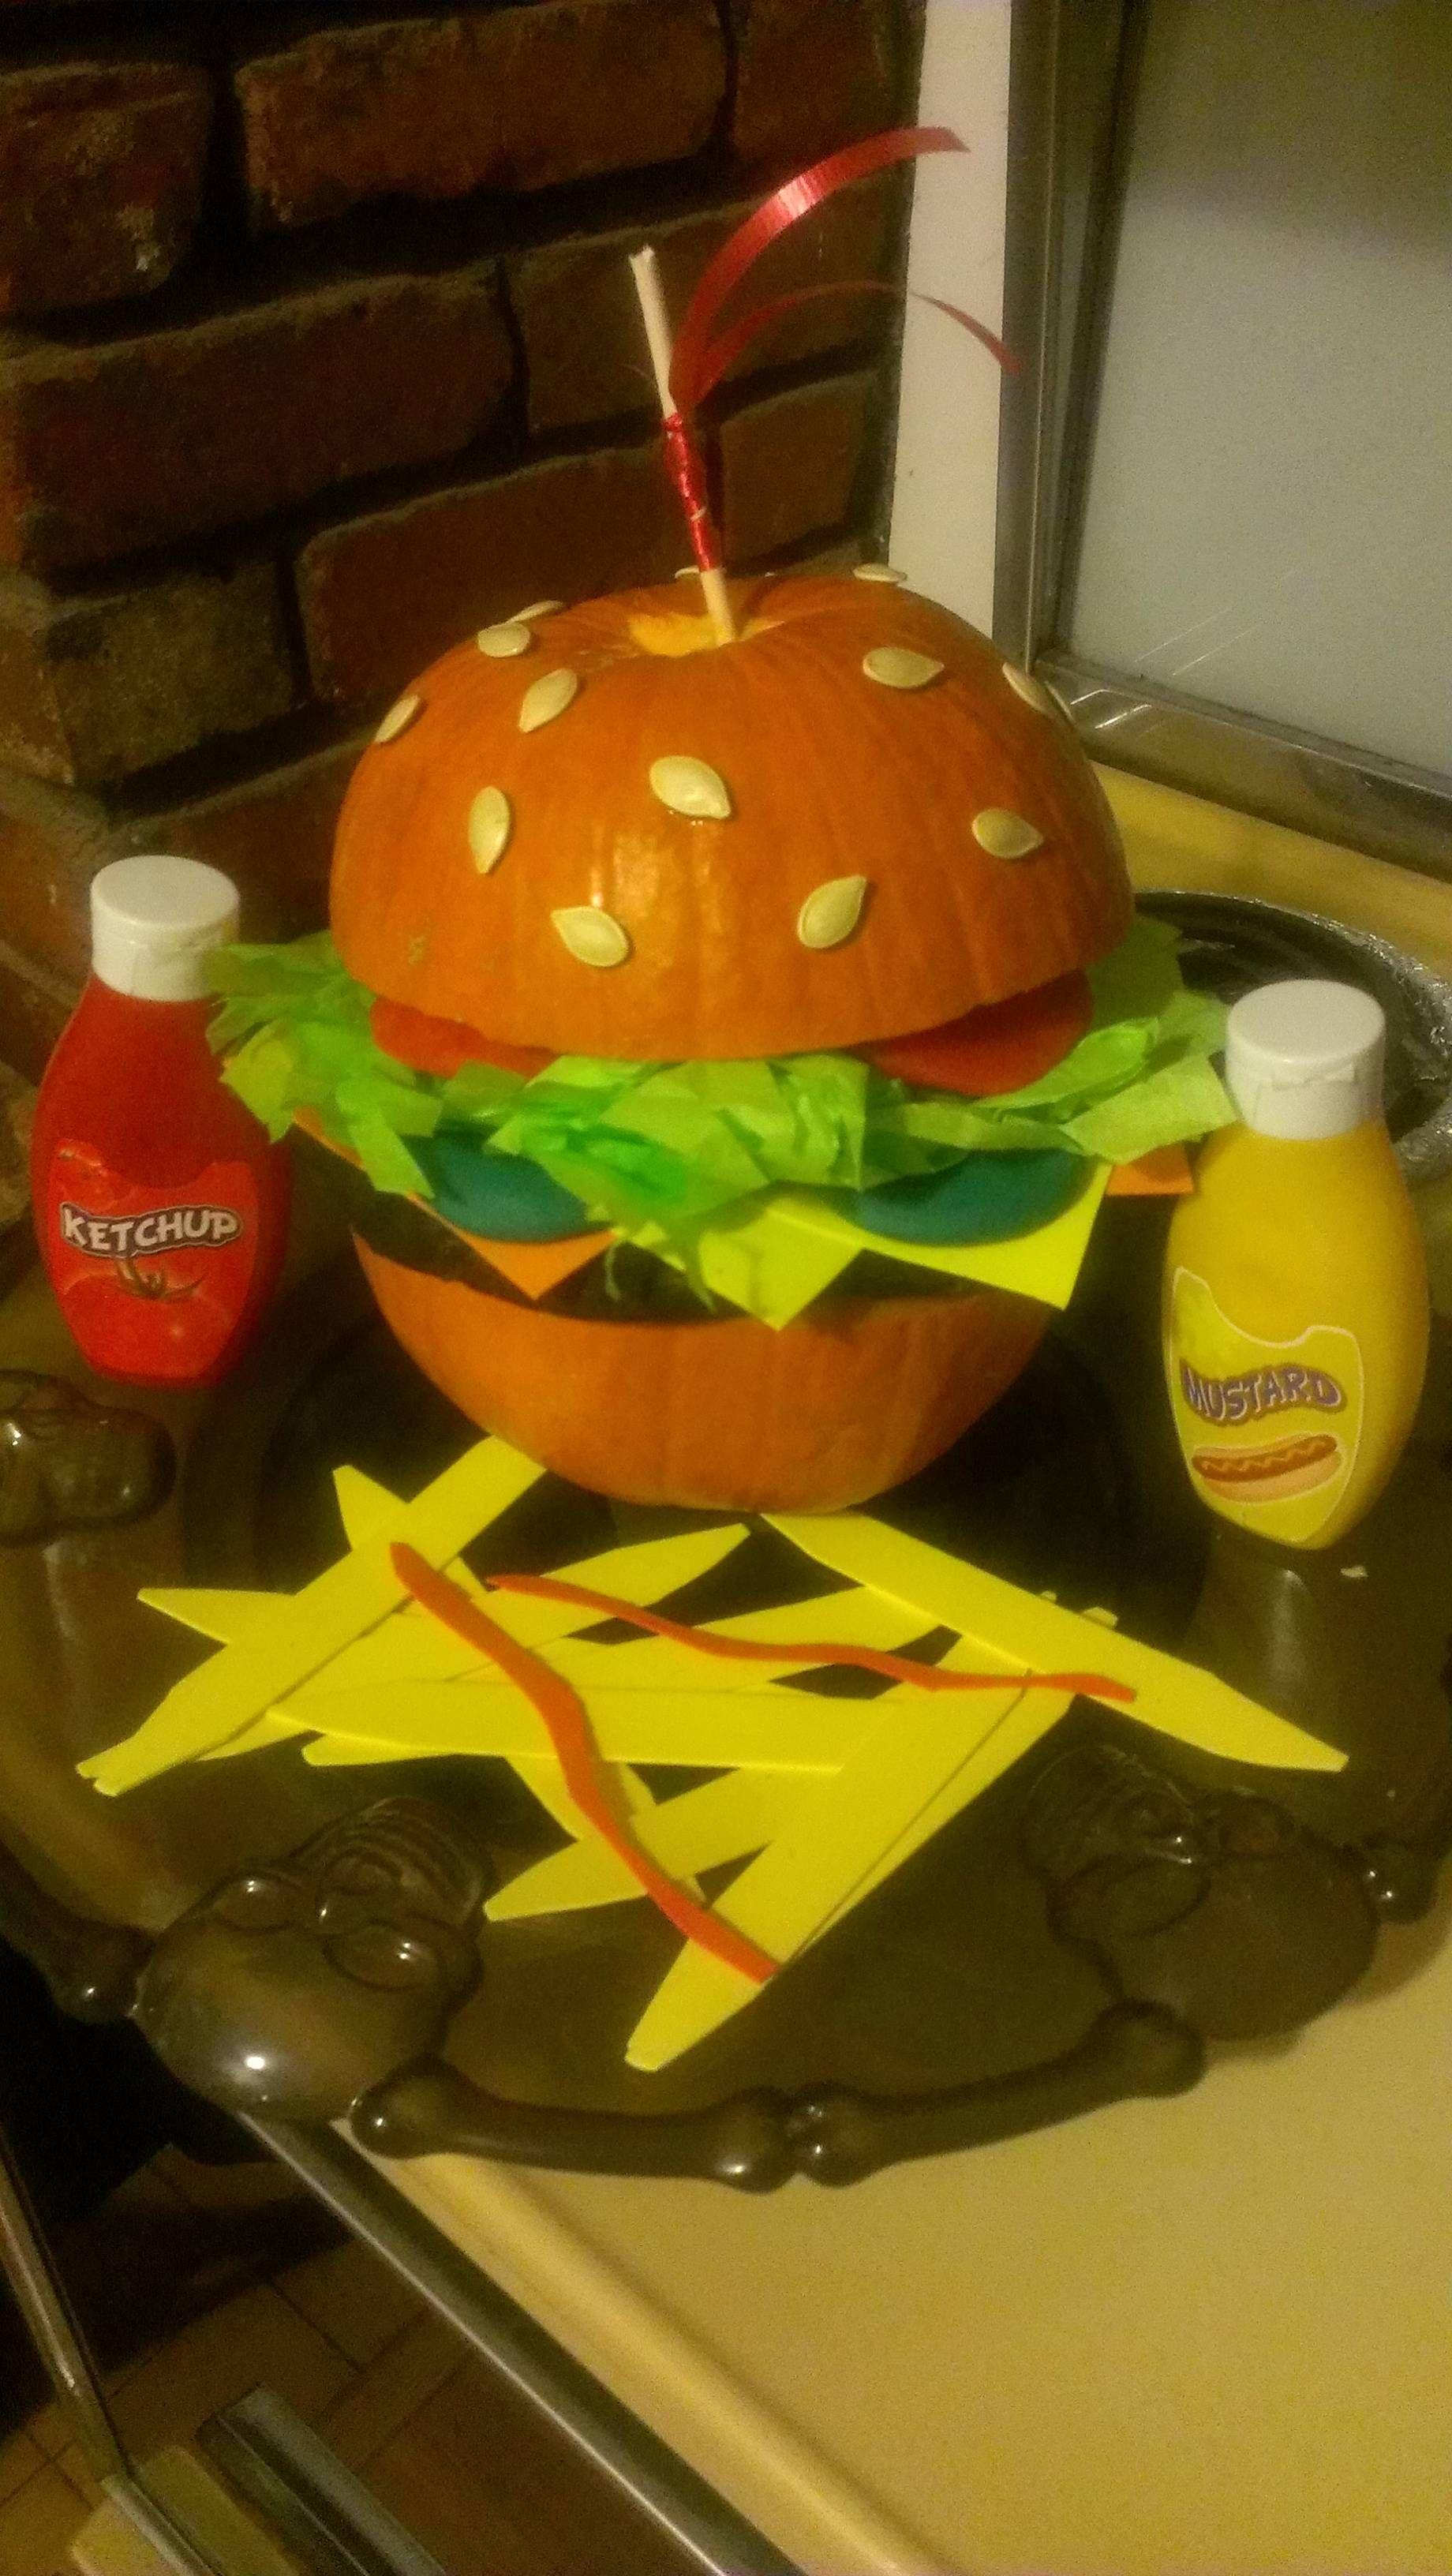 pumpkin burger  my fianc u00e9 u2019s entry into the pumpkin decorating contest at her work u2026